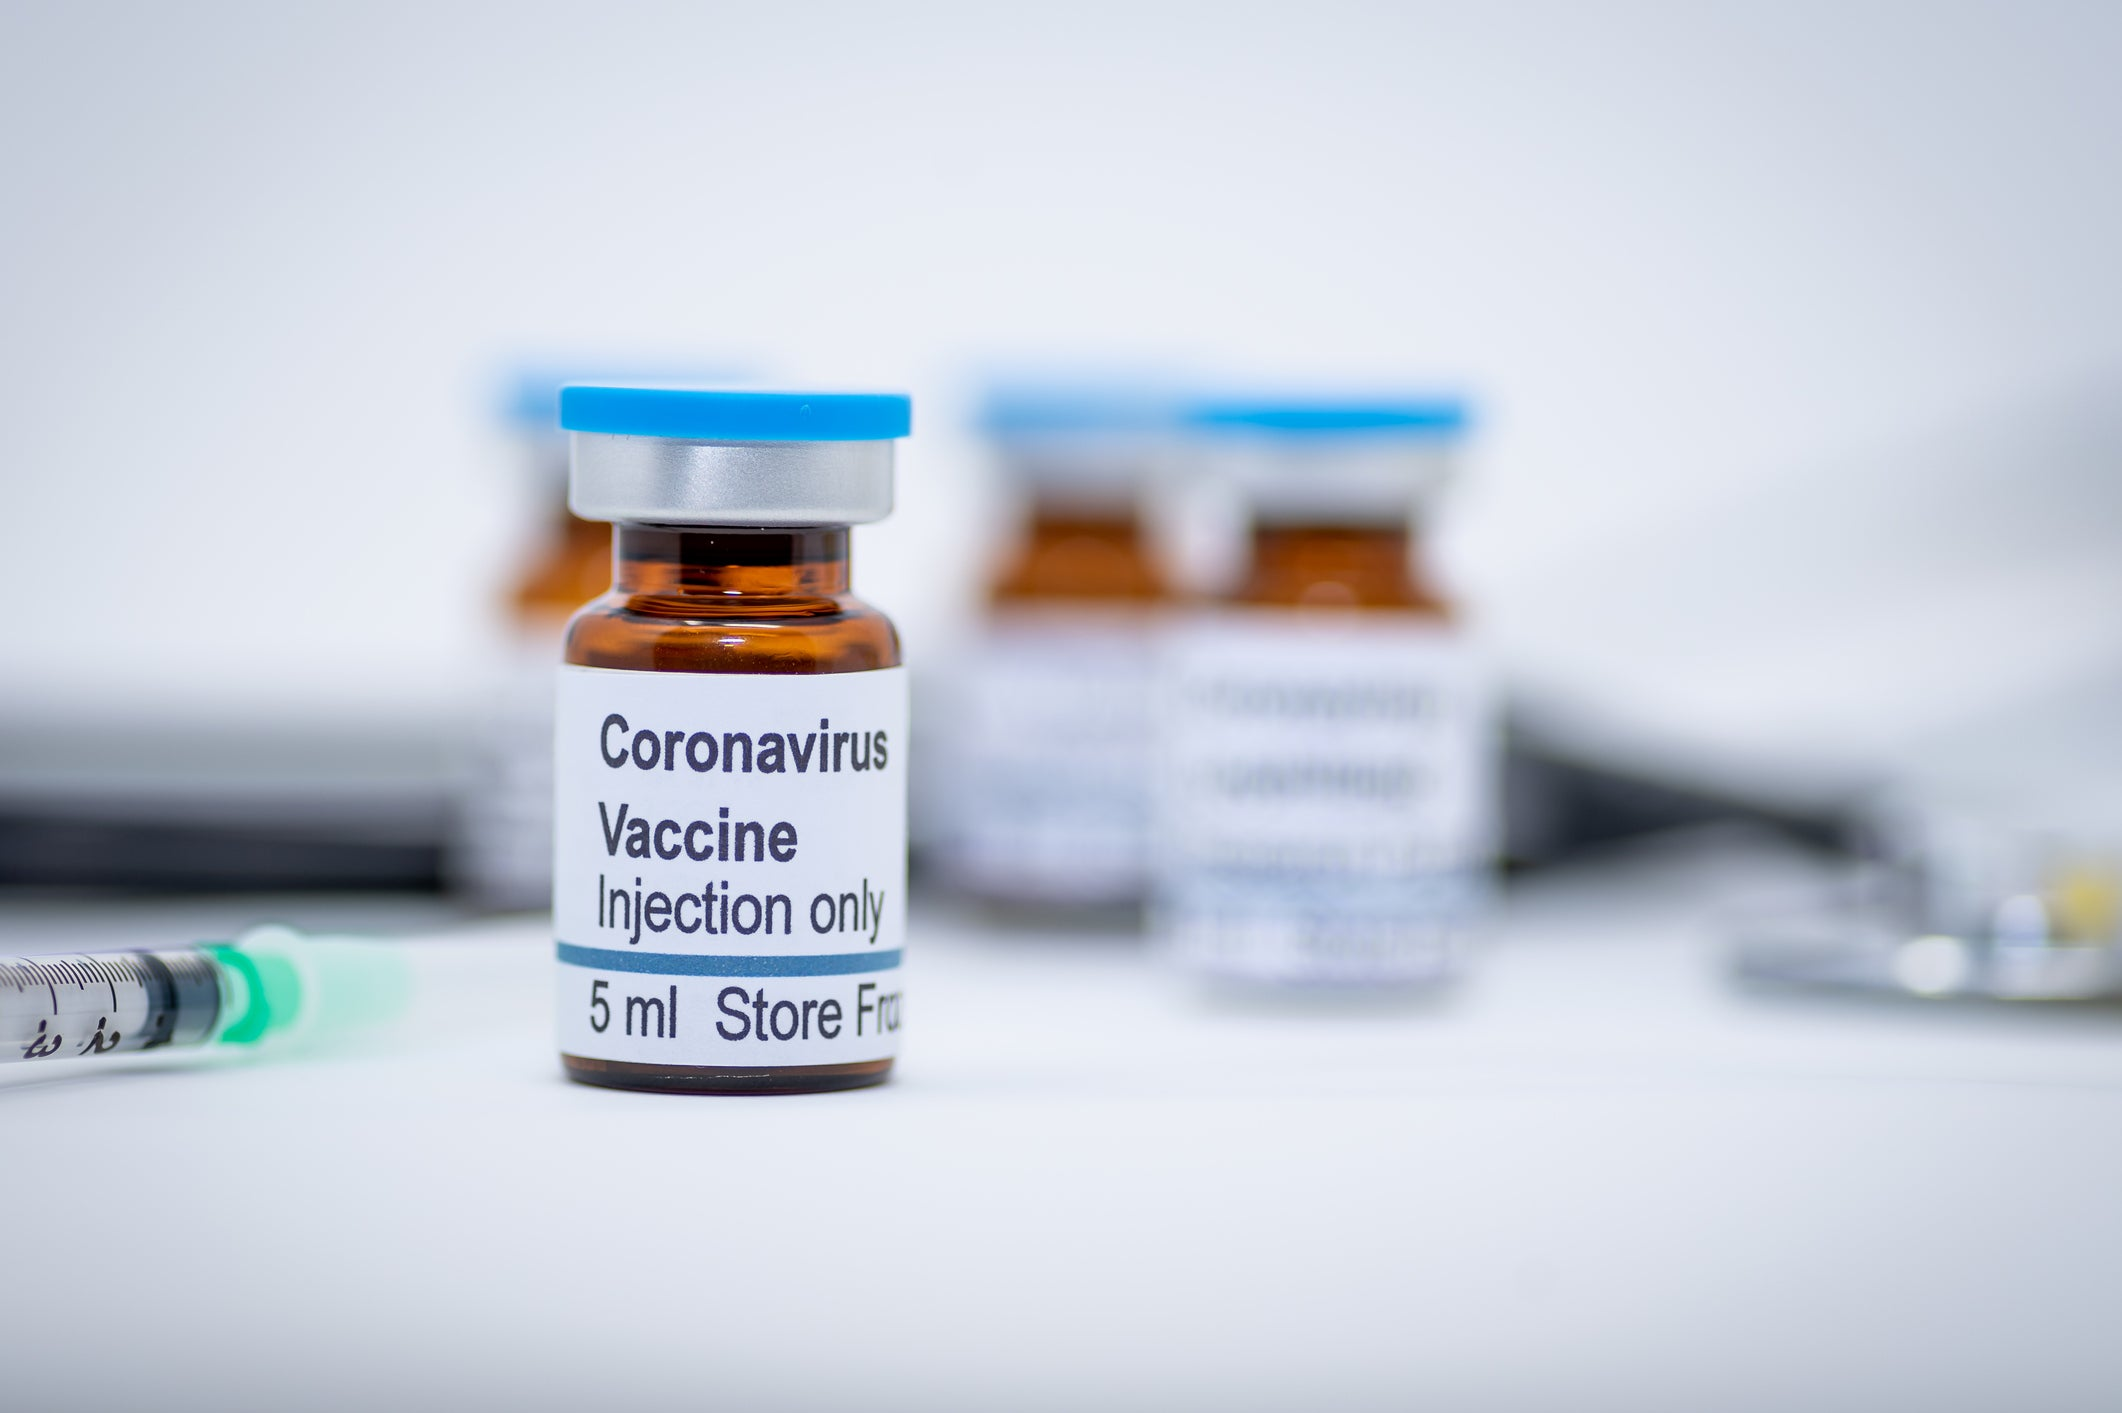 Better Coronavirus Stock: Moderna vs. Novavax | The Motley Fool